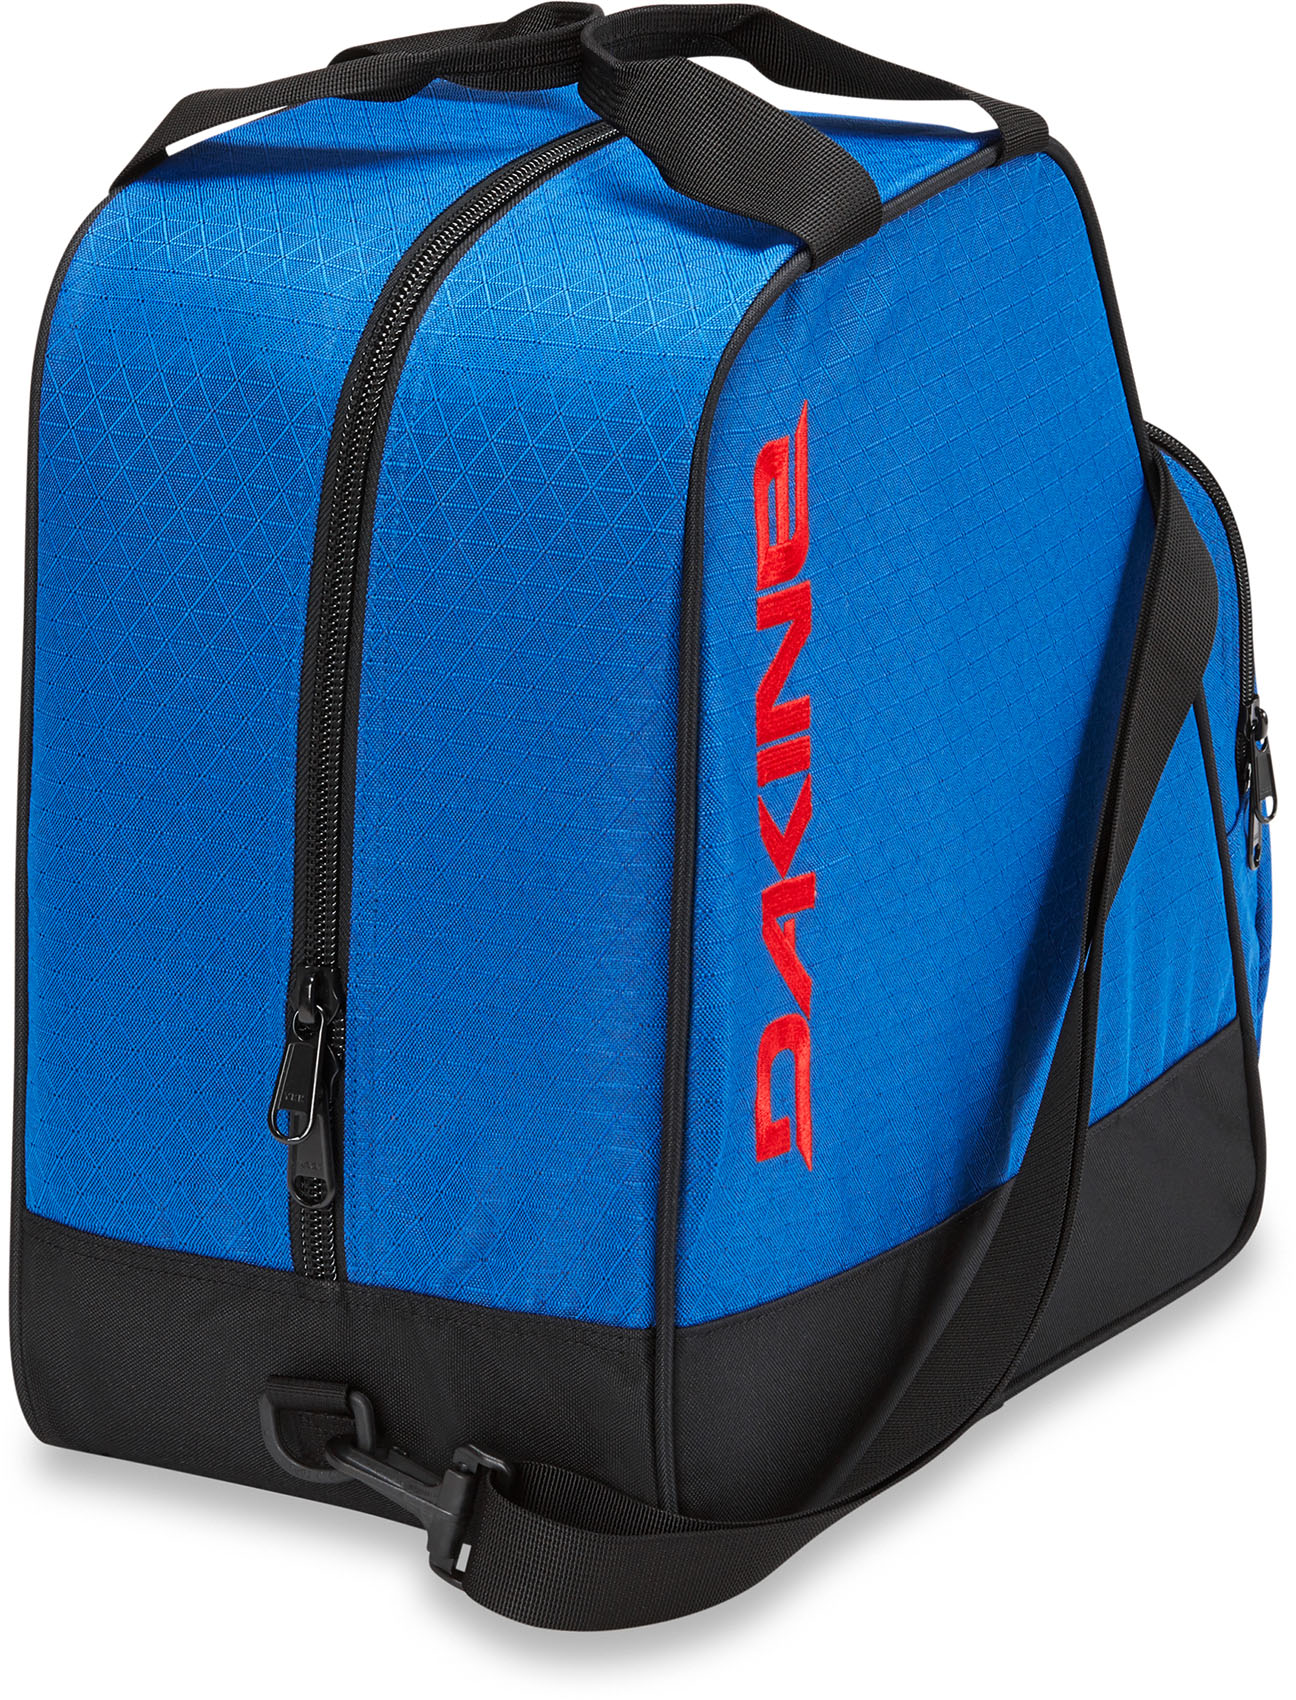 d6ad87a108c43 Dakine Luggage - Boot Bag 30L - Snowboard   Ski Boots